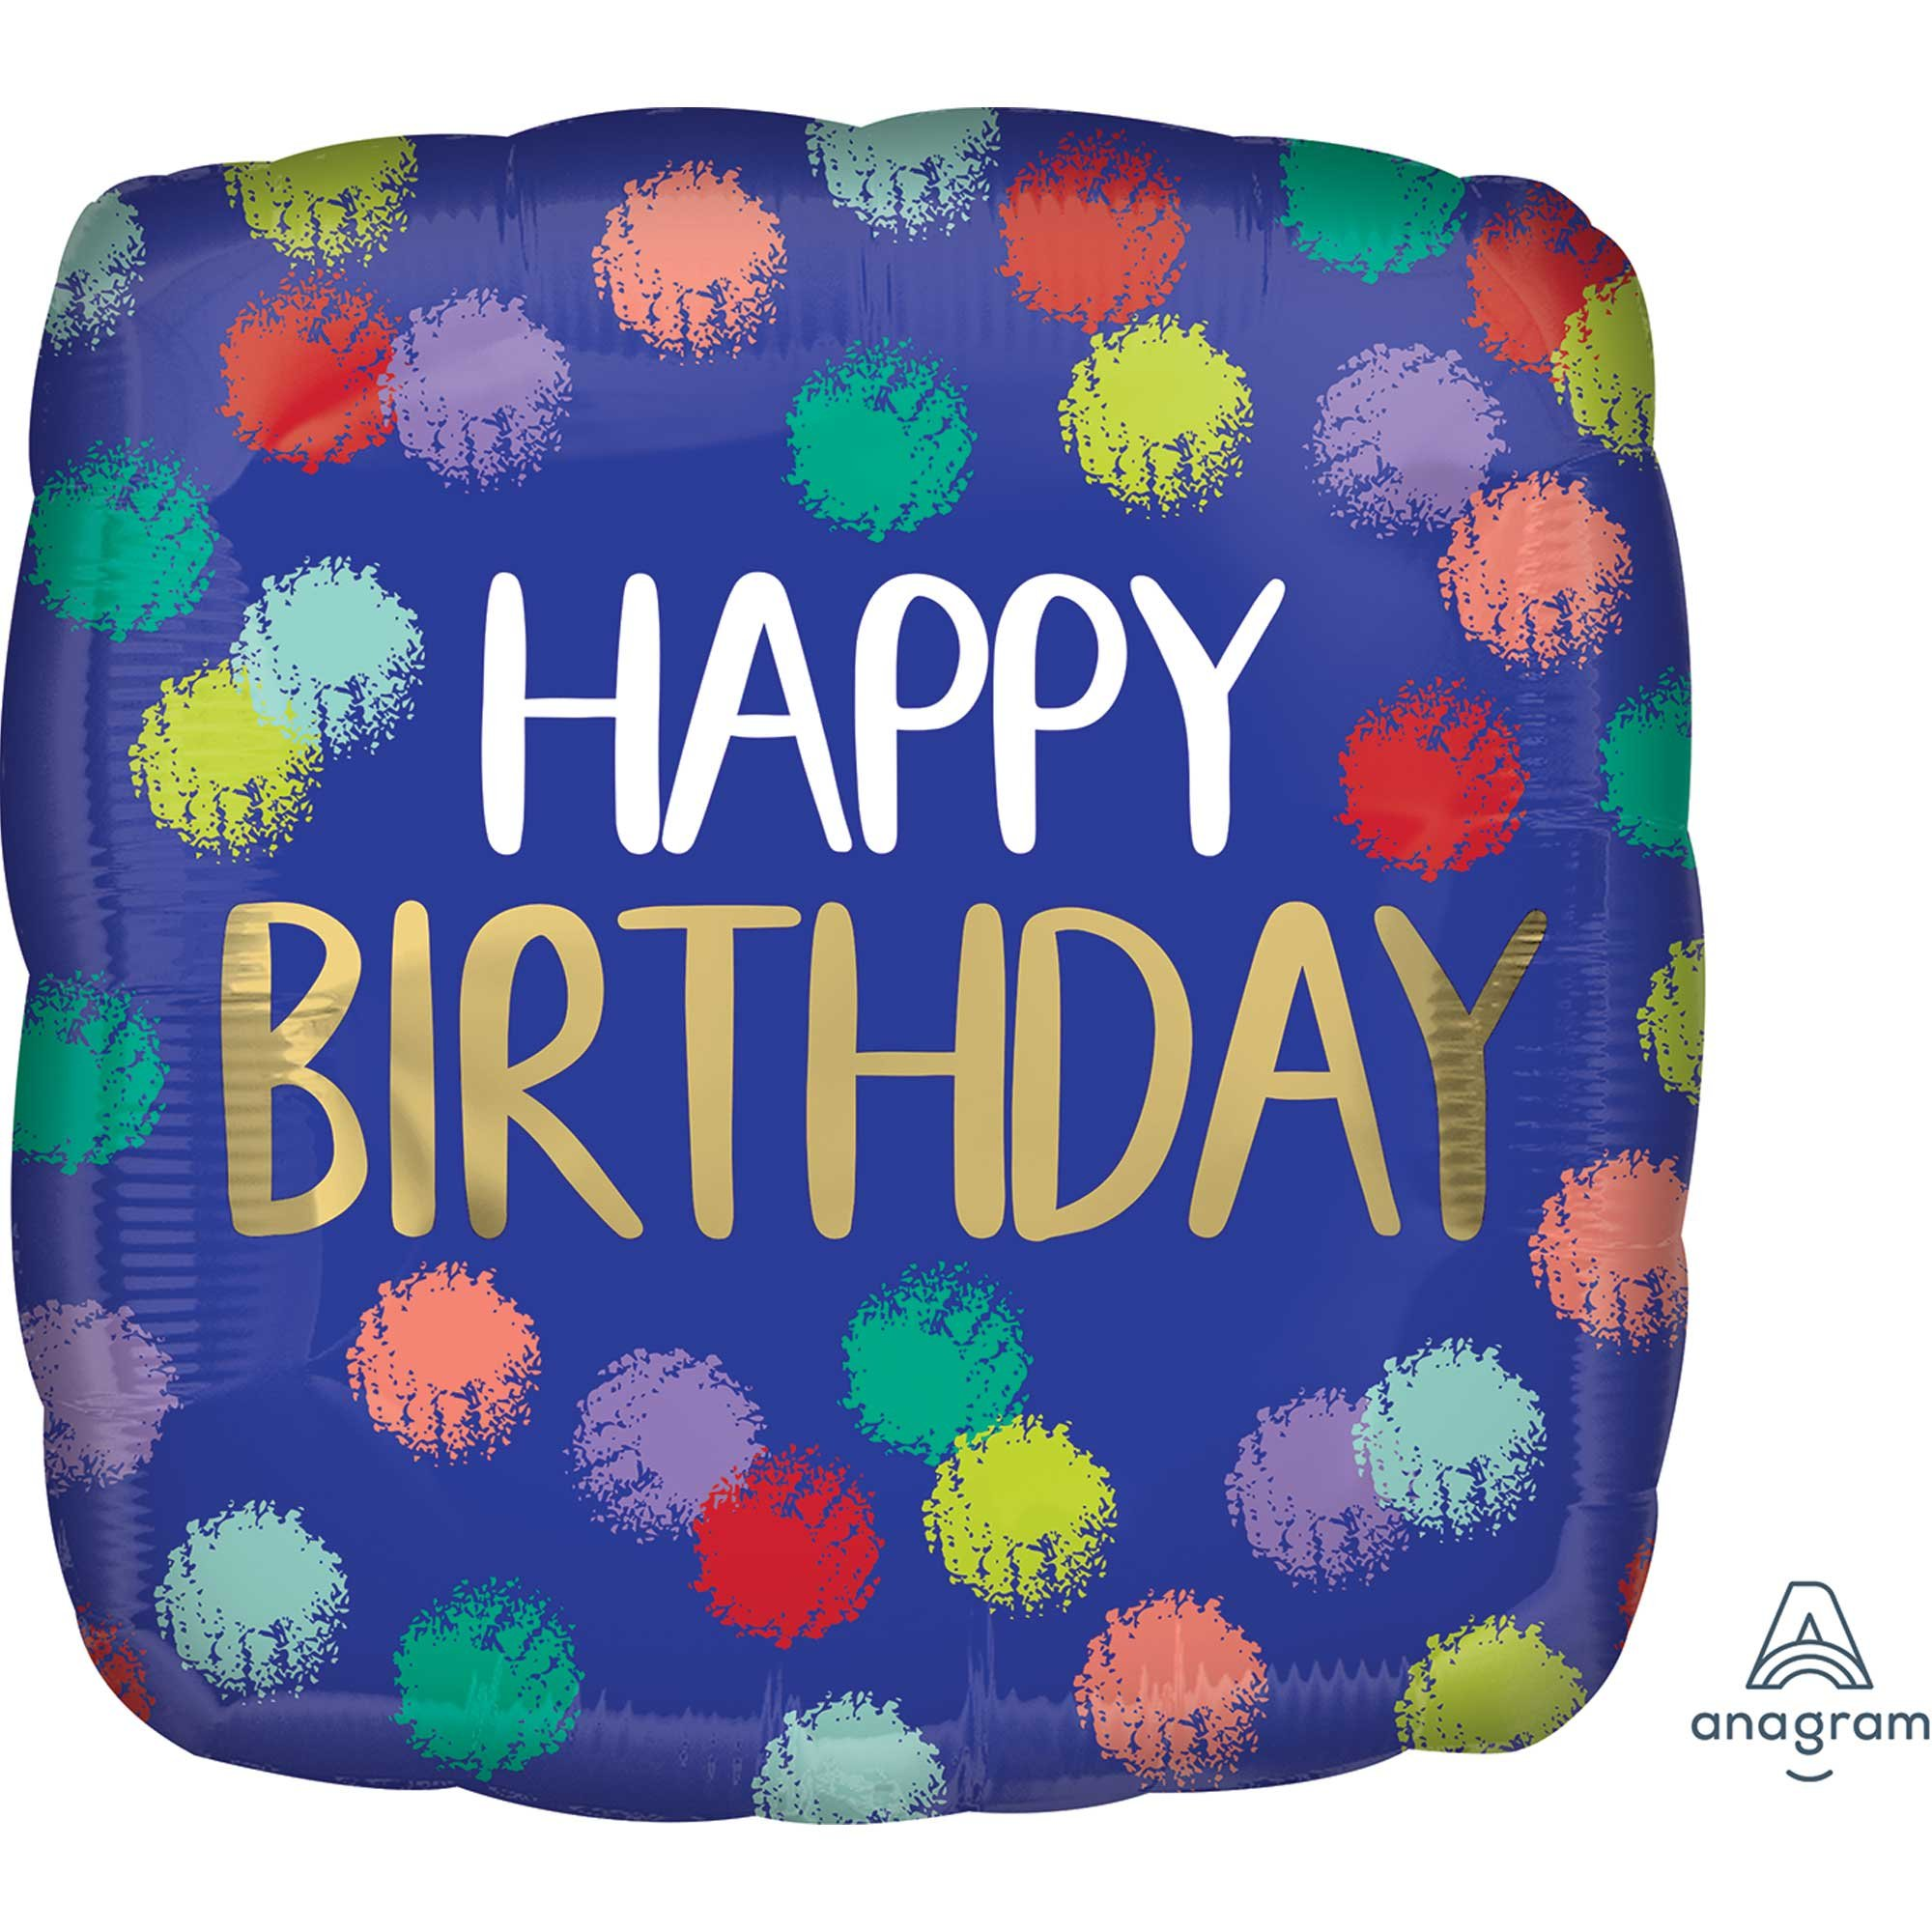 45cm Standard HX Brushed Happy Birthday S40